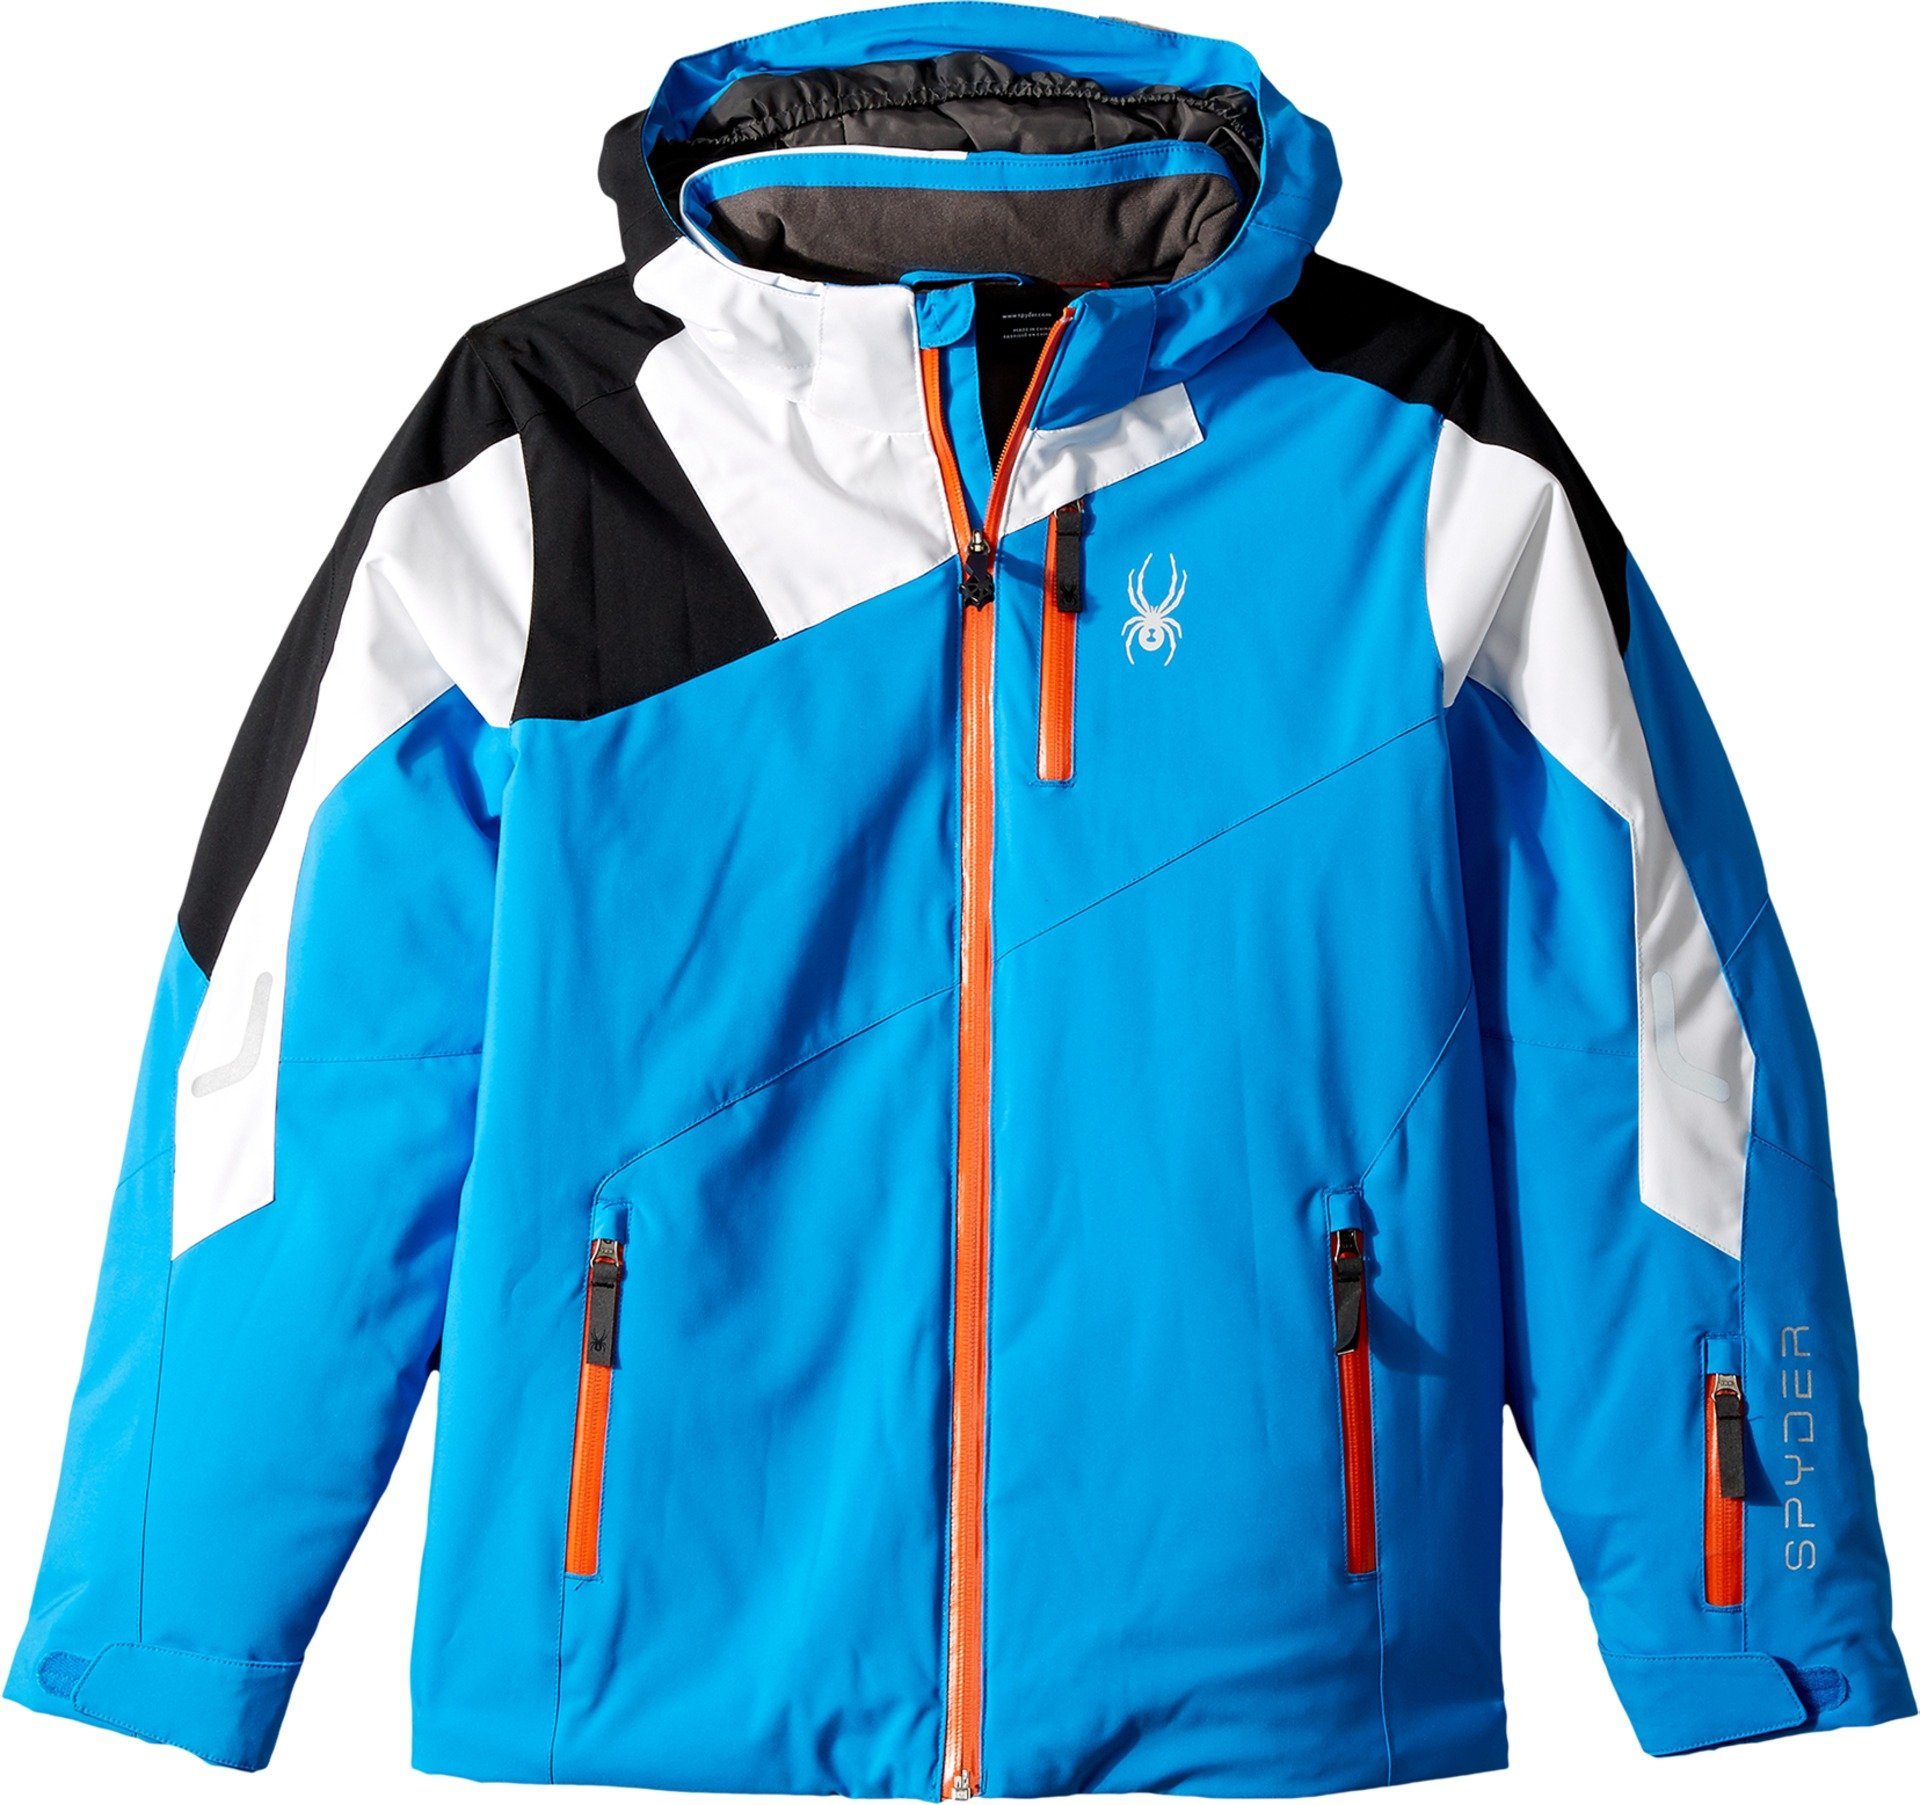 Spyder Kids Boy's Avenger Jacket (Big Kids) Fresh Blue/White/Black 12